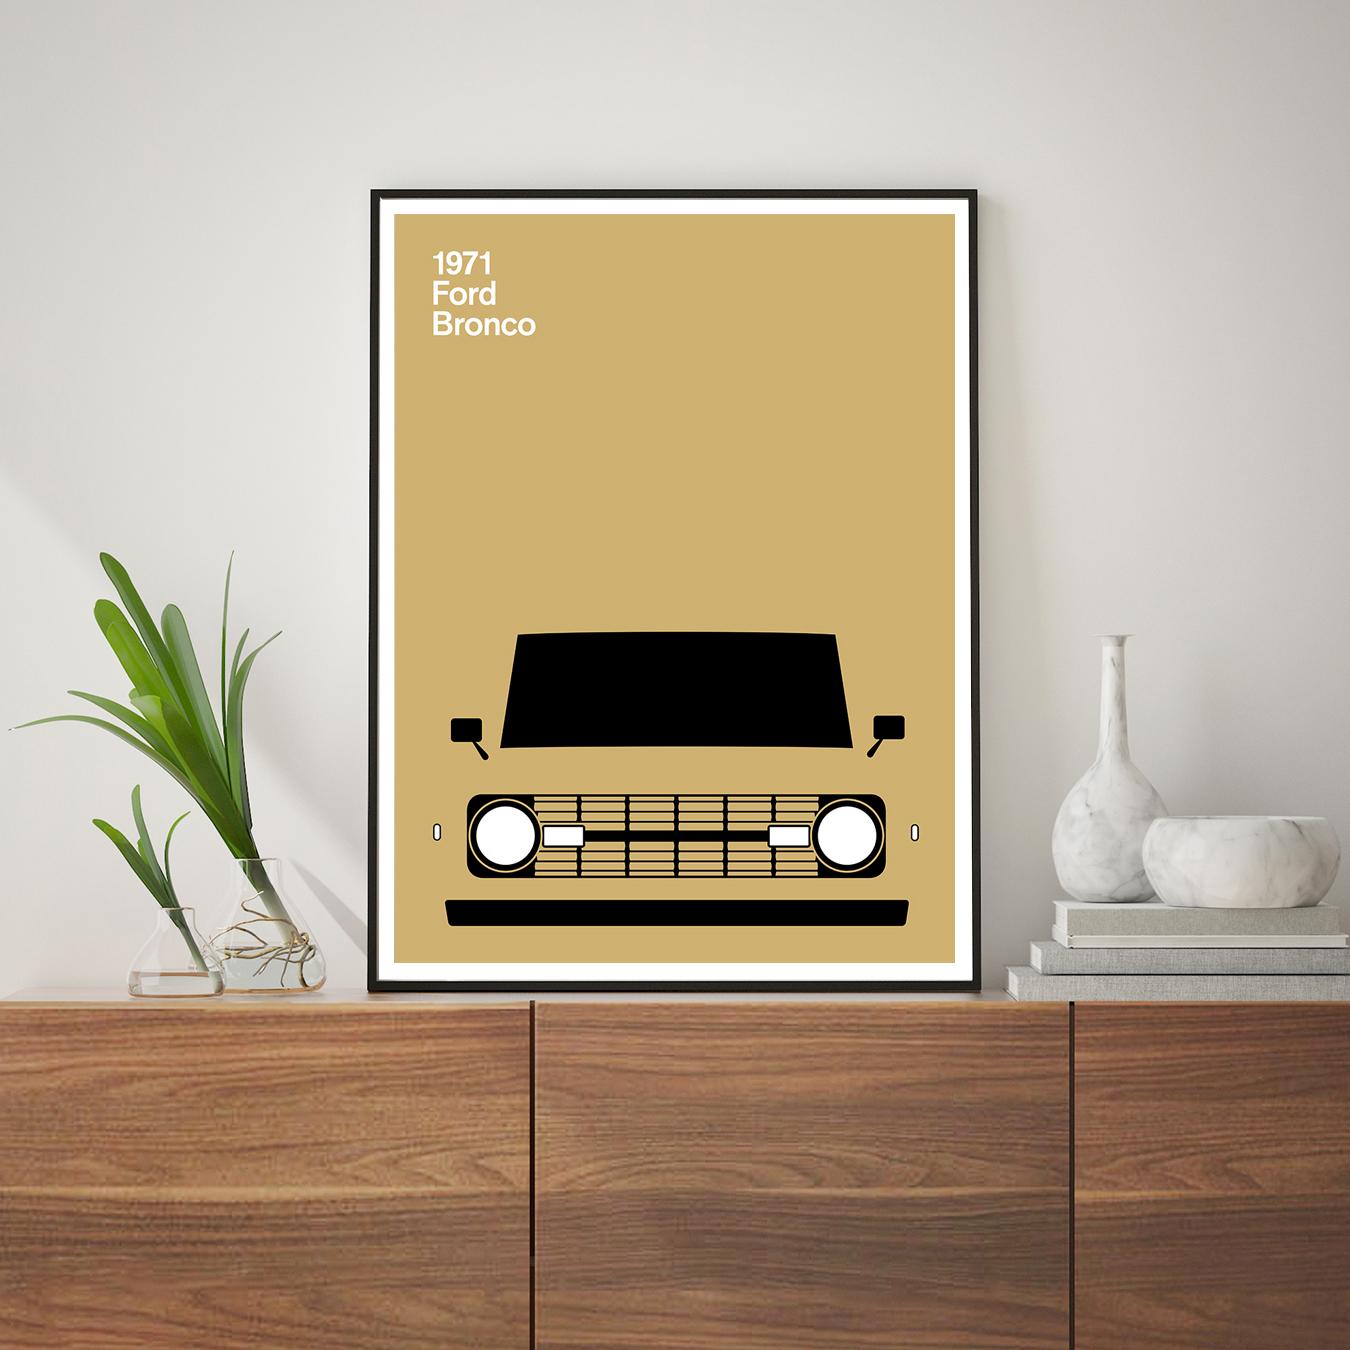 1971 Ford Bronco lifestyle.jpg